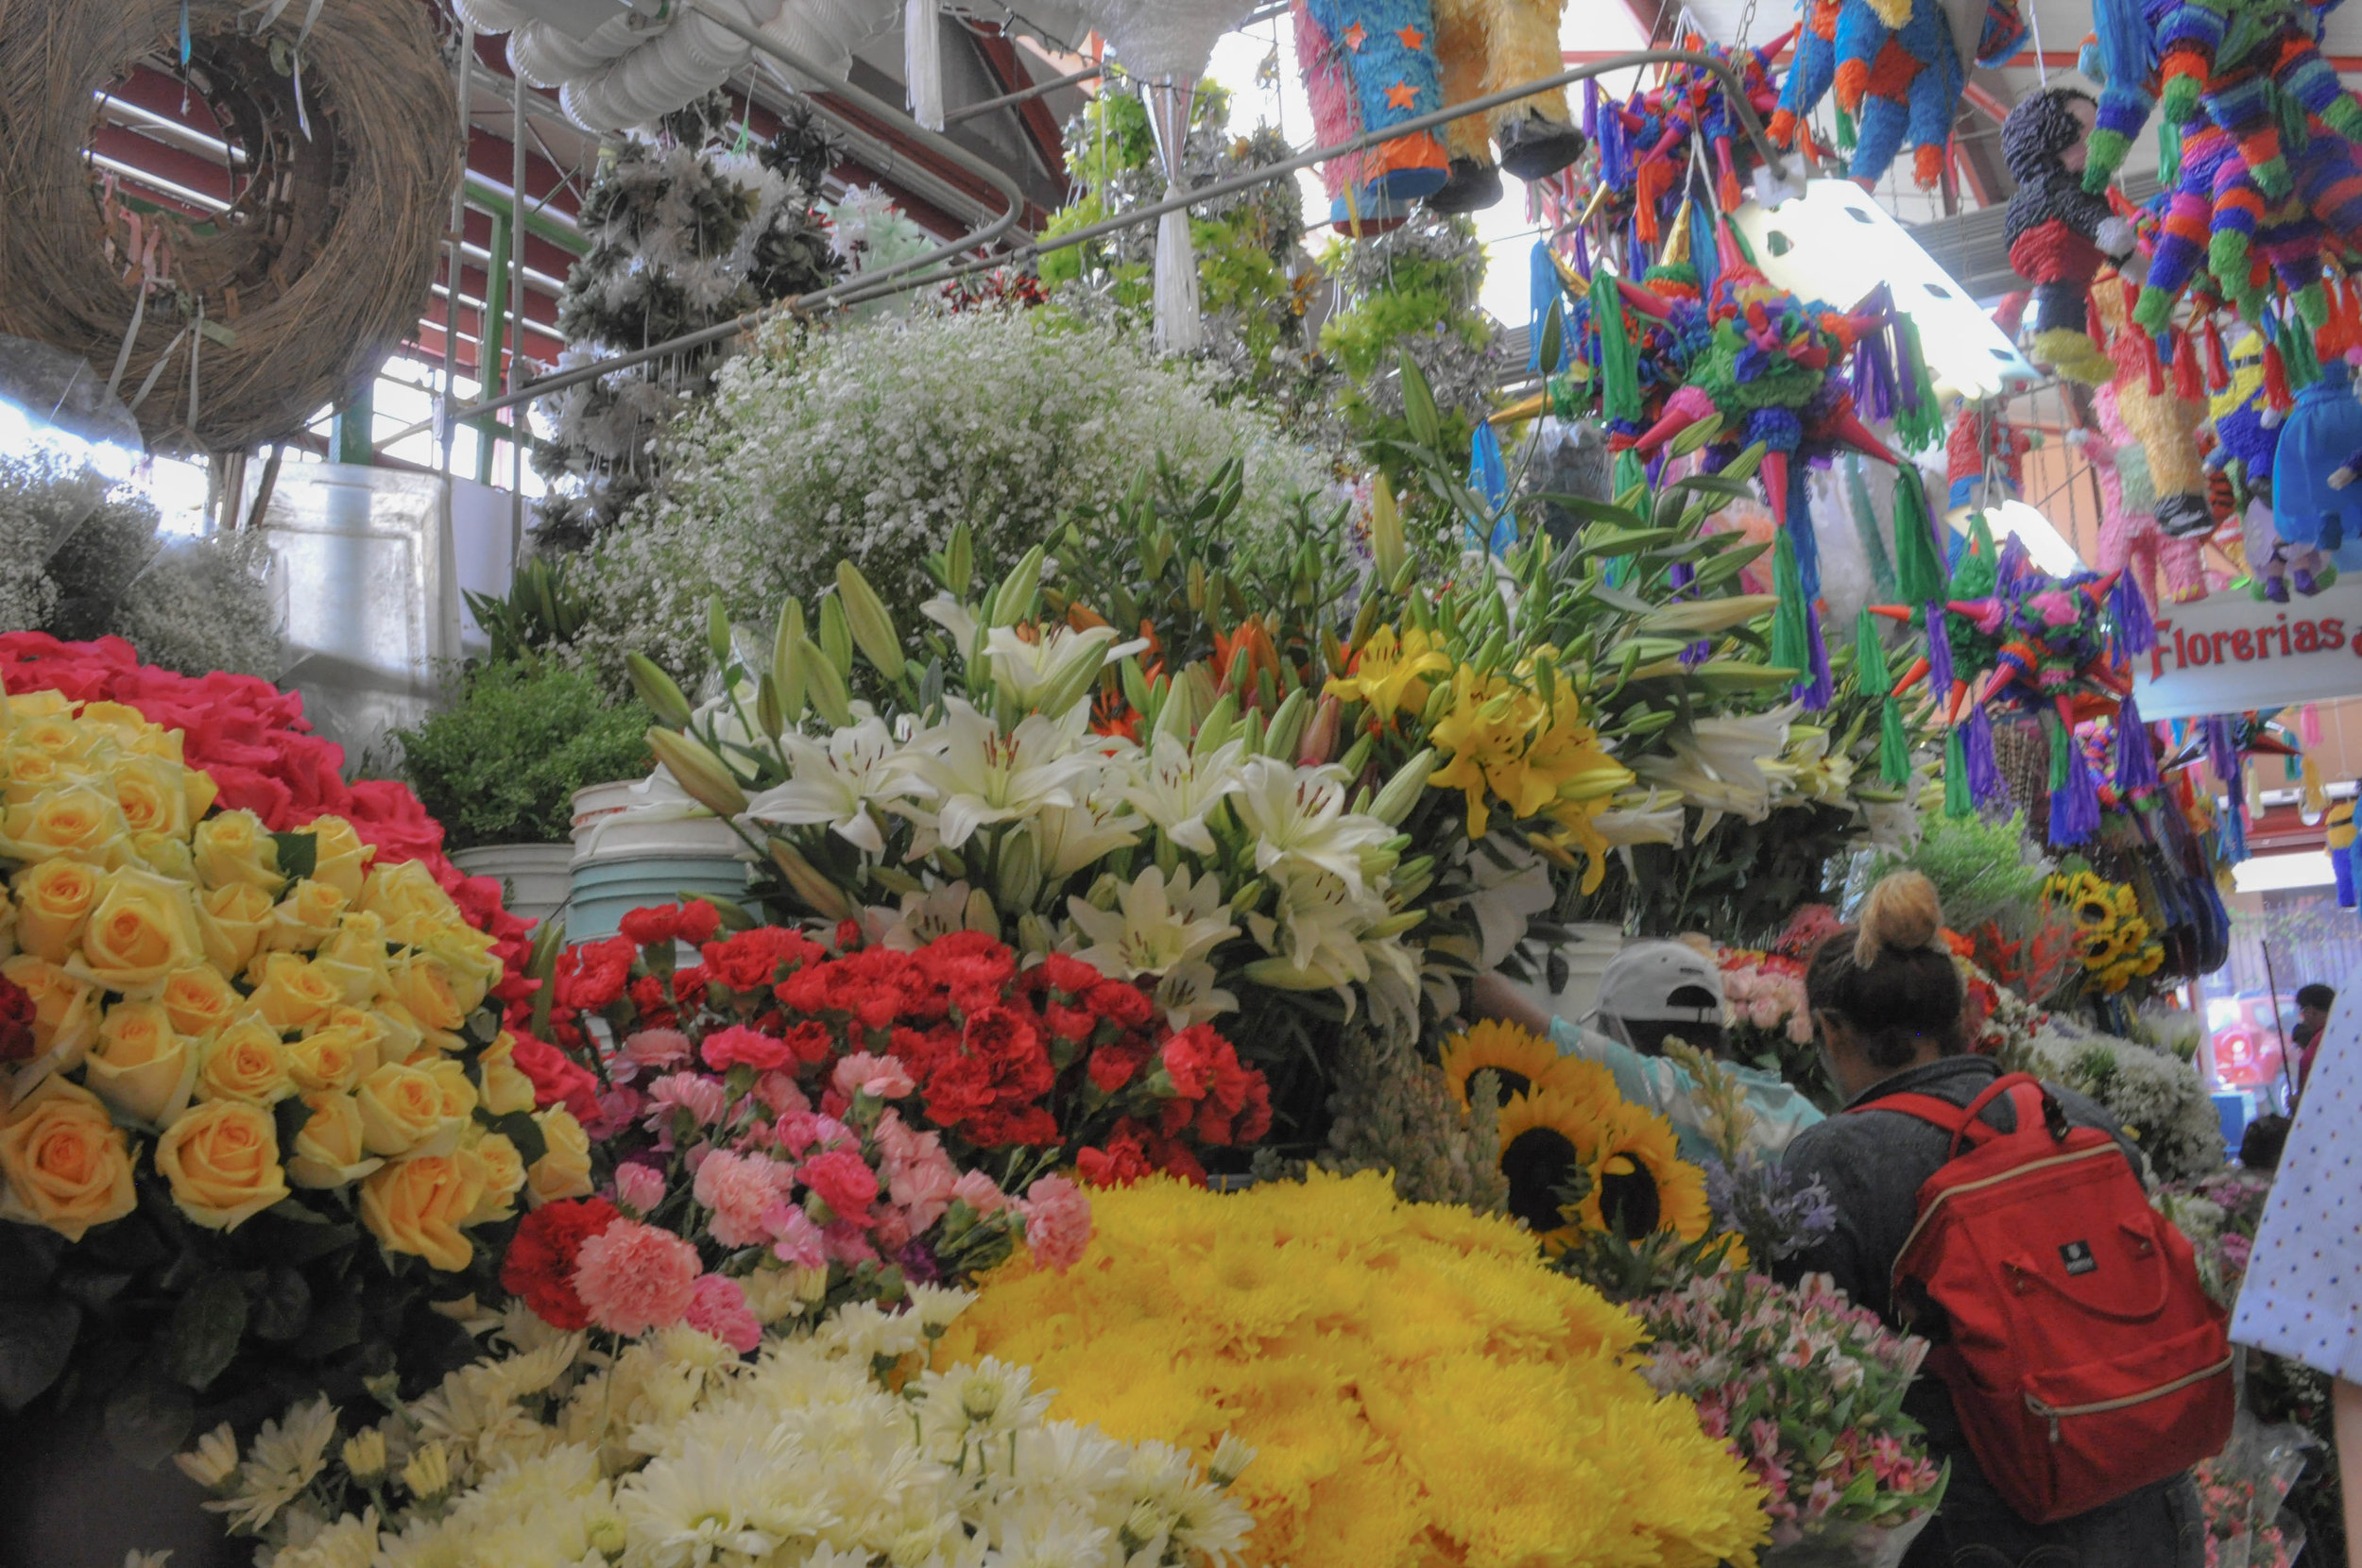 Mercado/Market